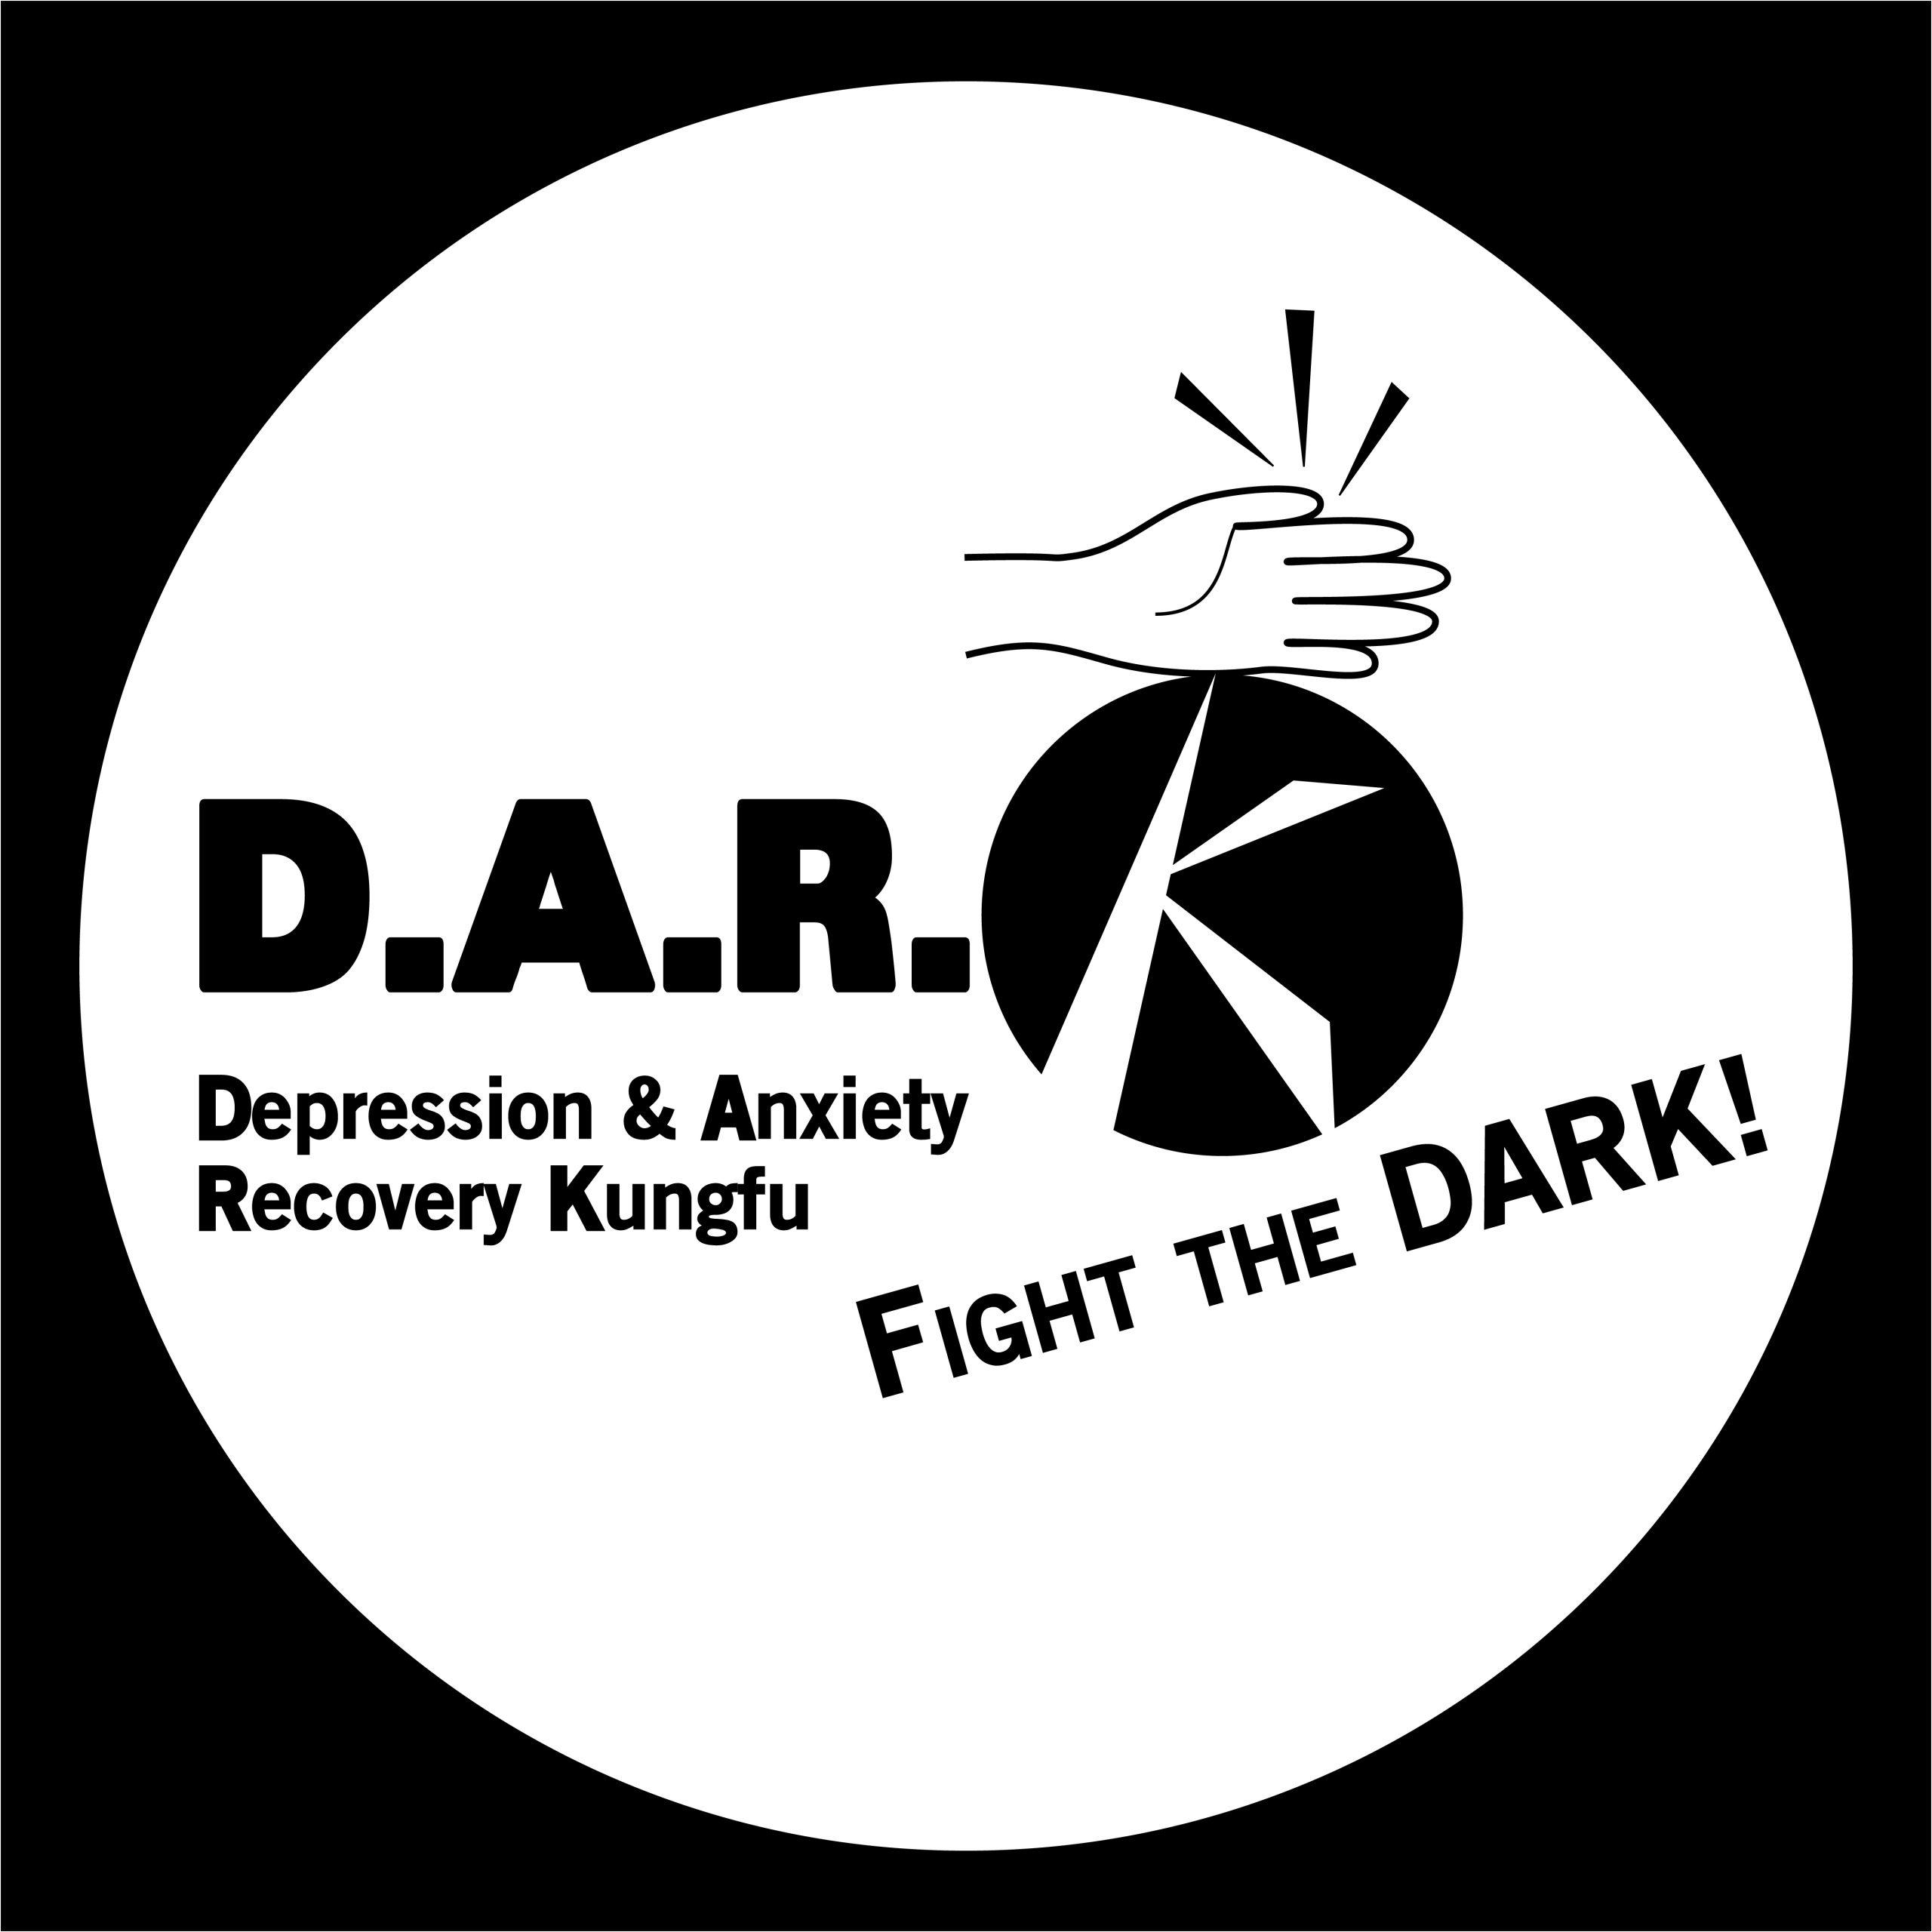 DepressionKungfu DARK logo